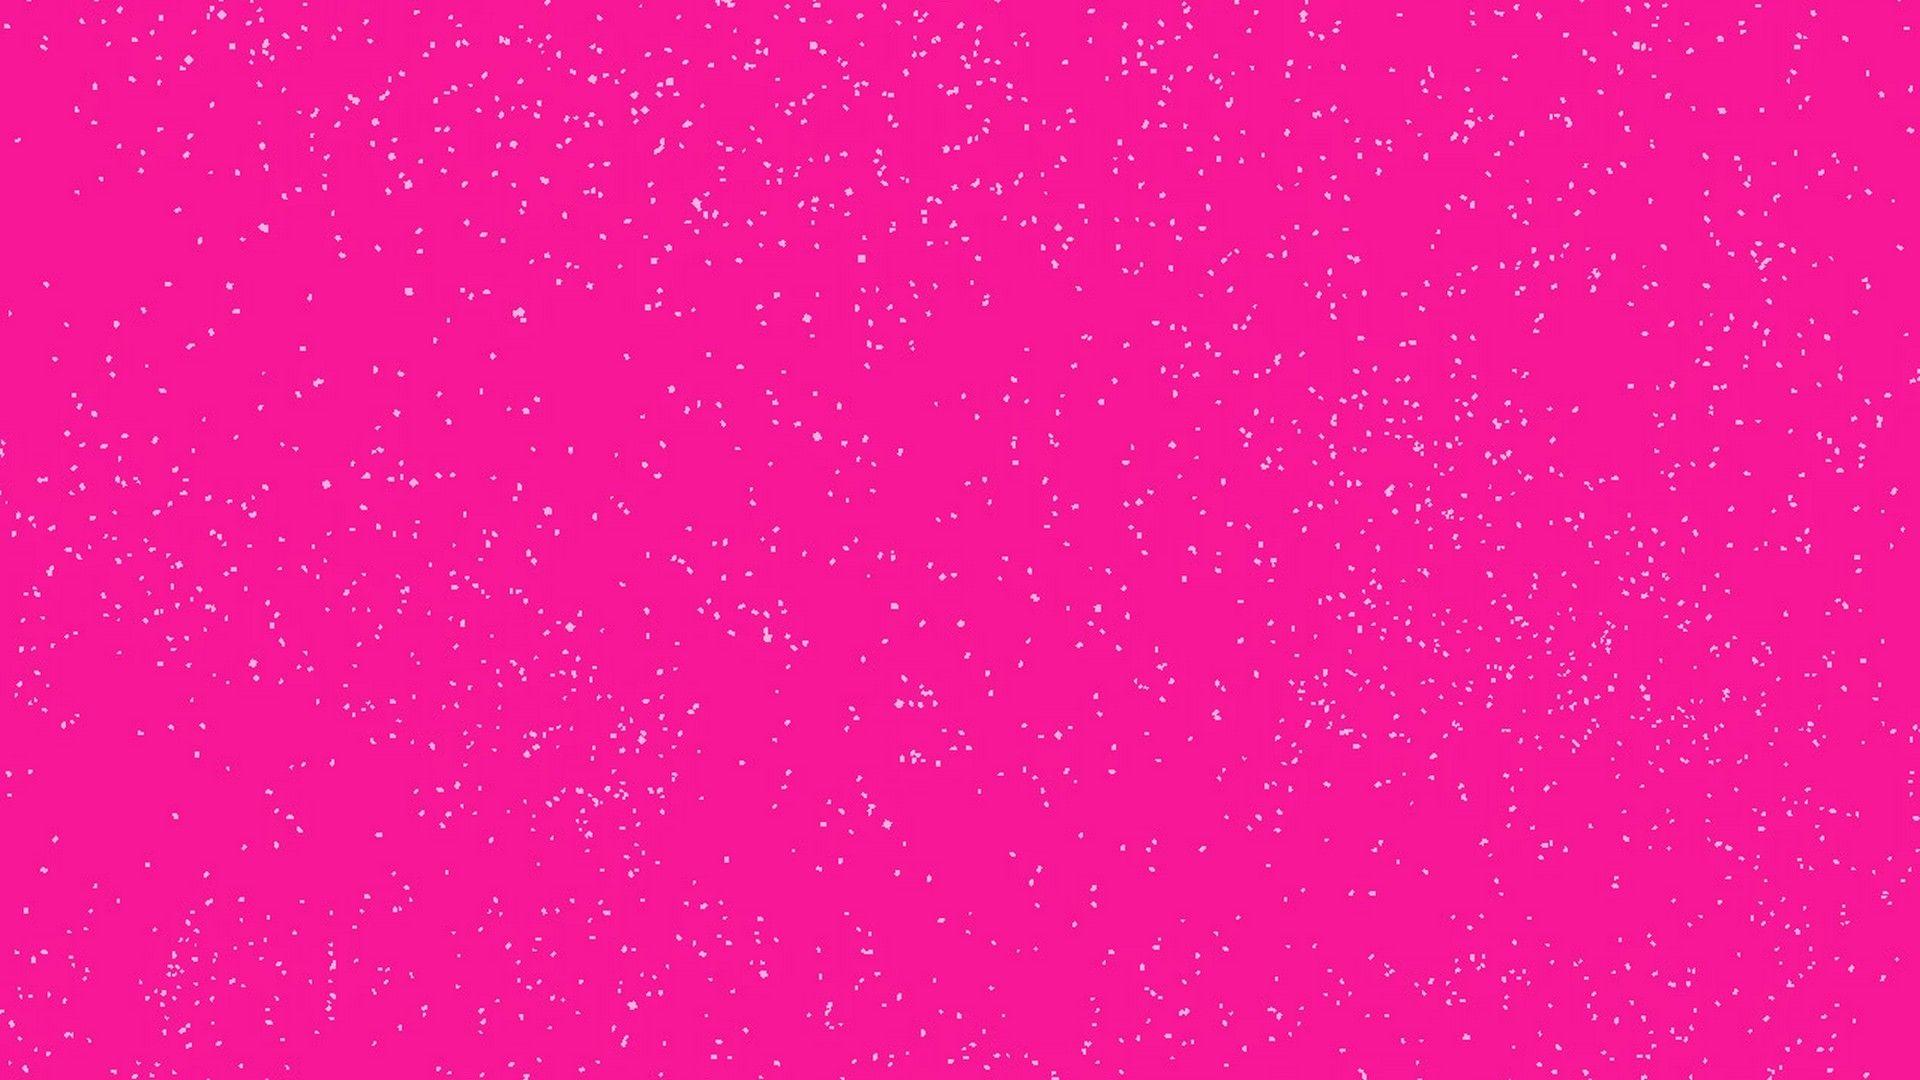 HD Pink Glitter Wallpaper